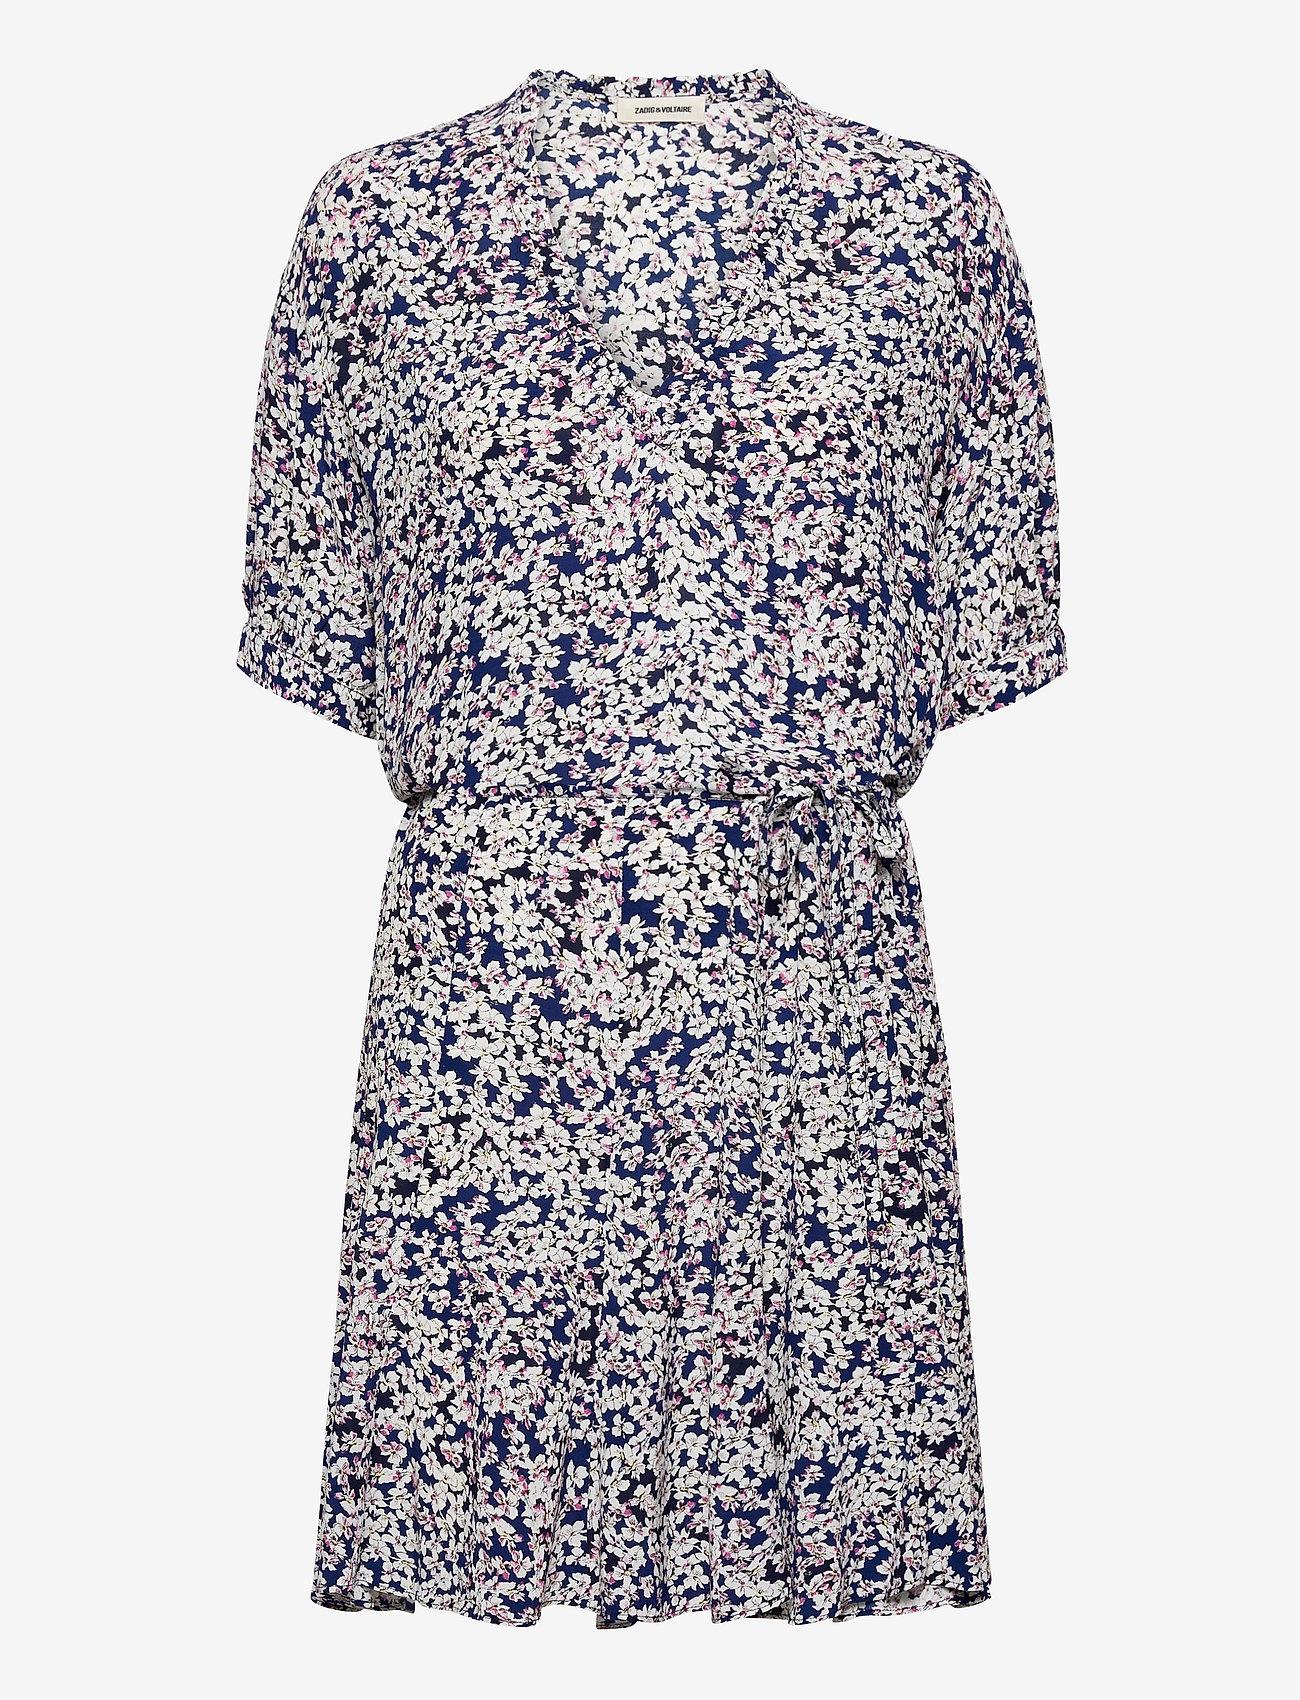 Zadig & Voltaire - REMOVE CDC PRINT BEGONIA DRESS - sommerkjoler - bleu de chine - 1